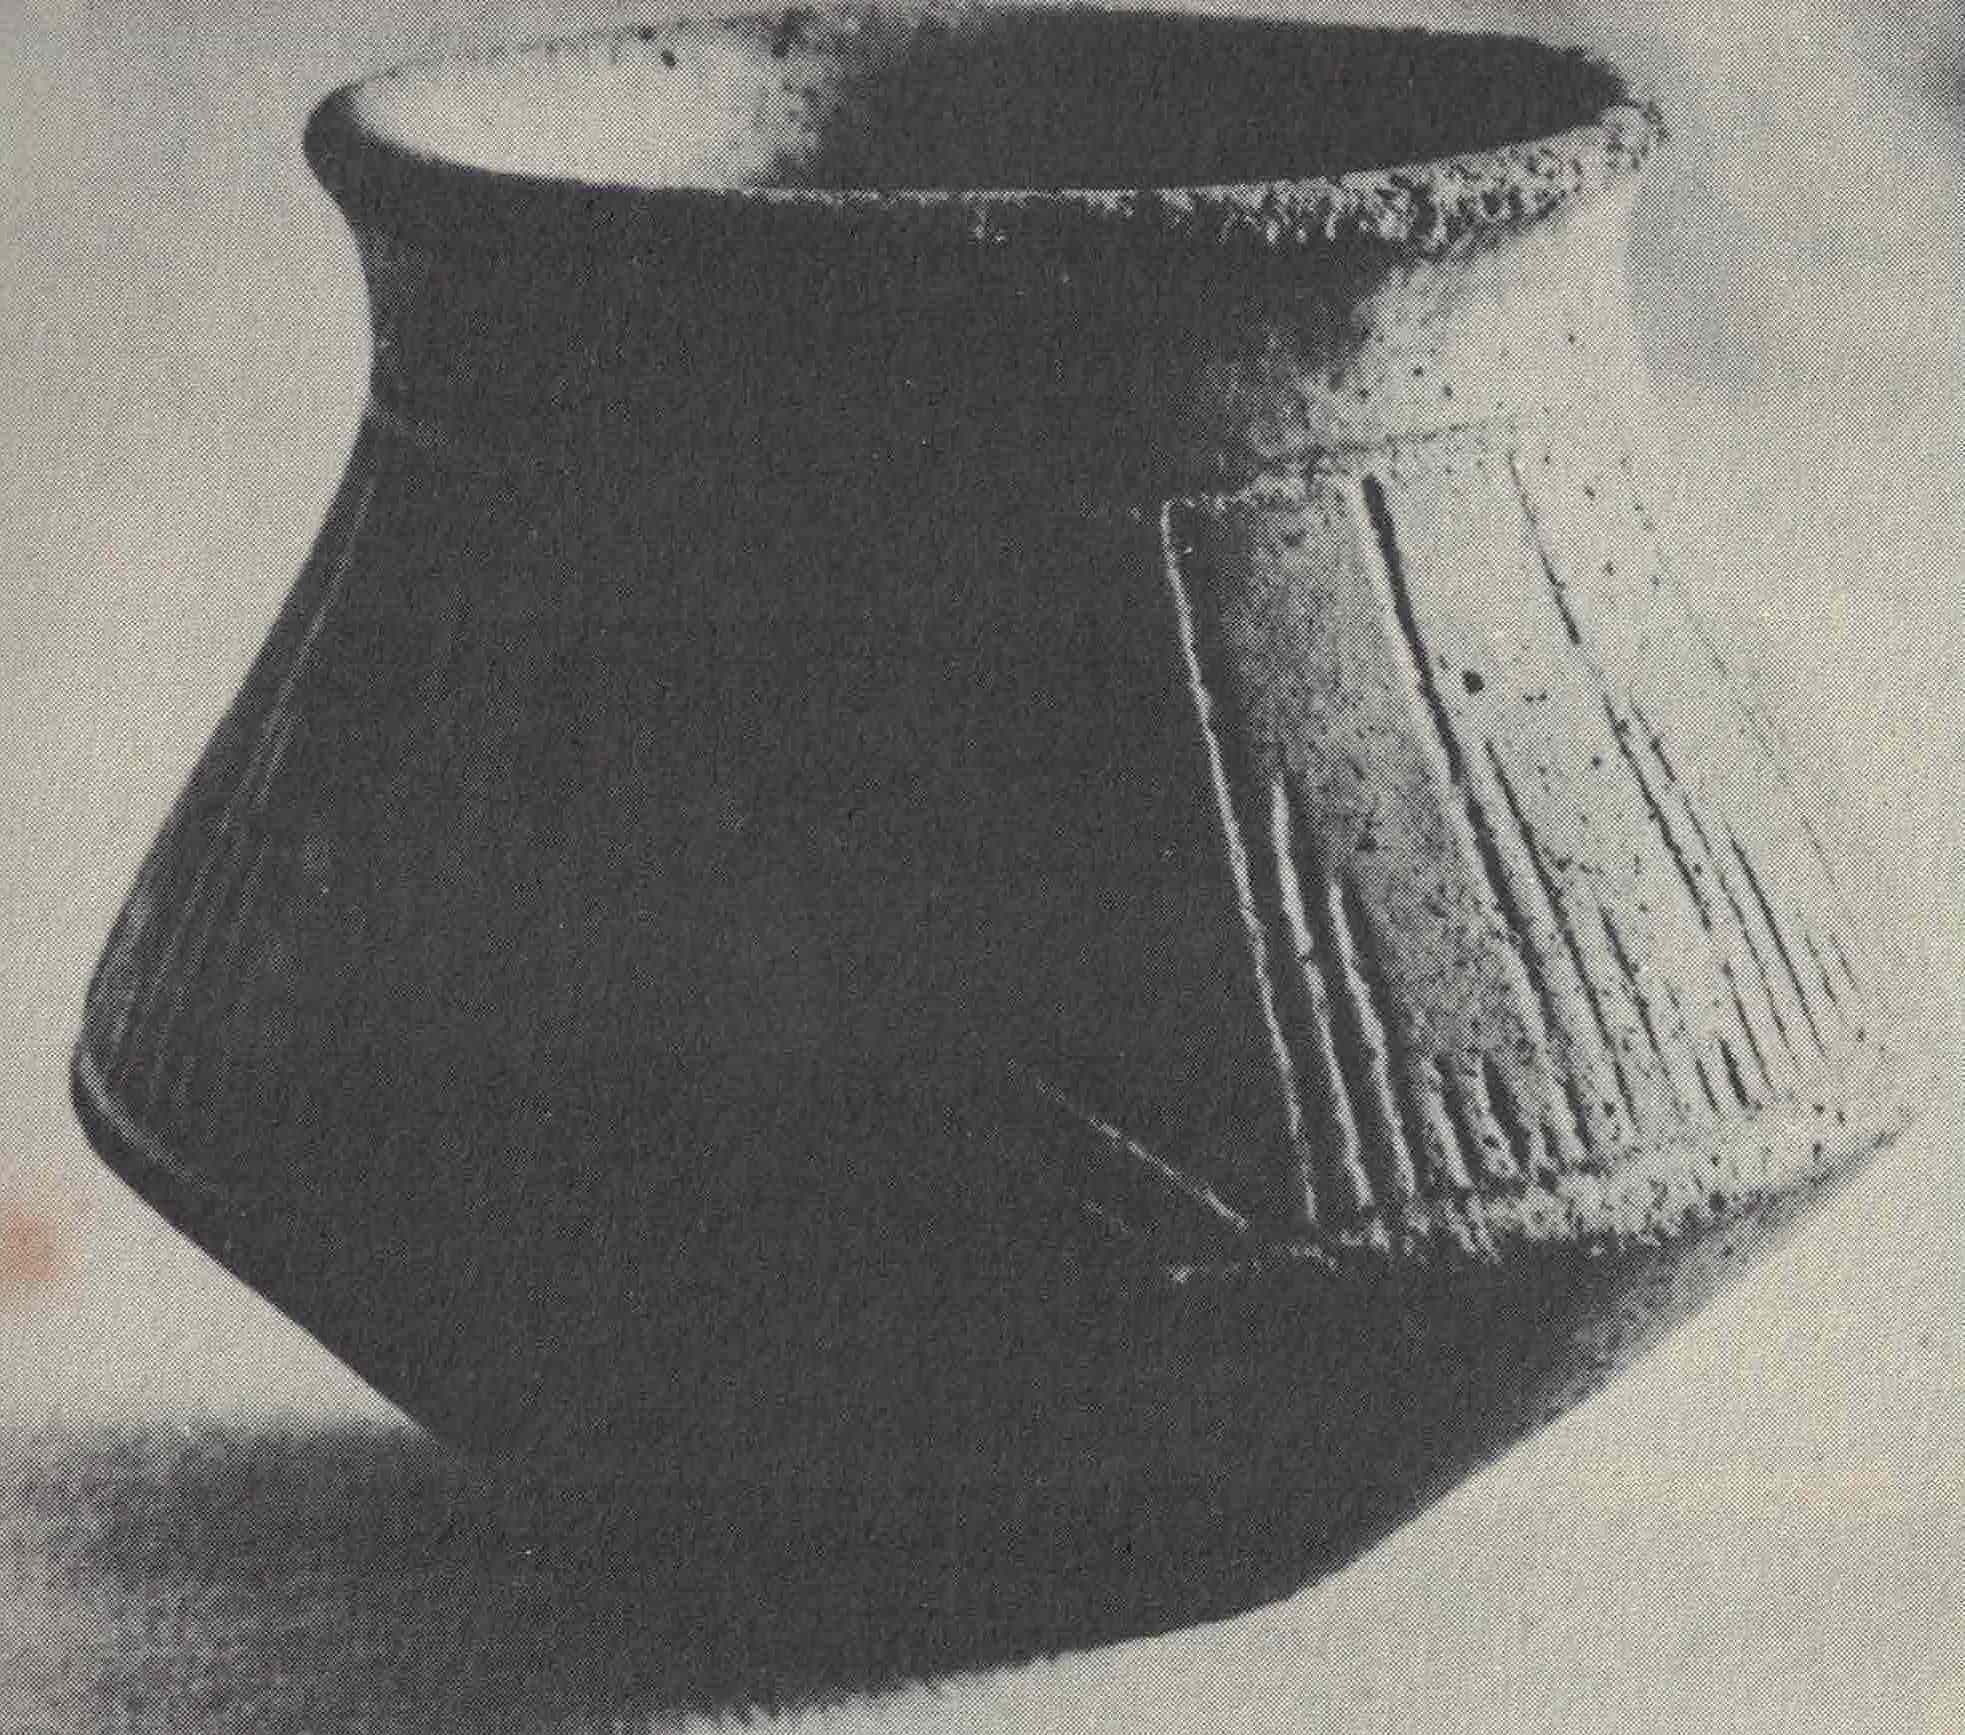 Figura 2. Jarro neolítico (ca. 3 mil anos)